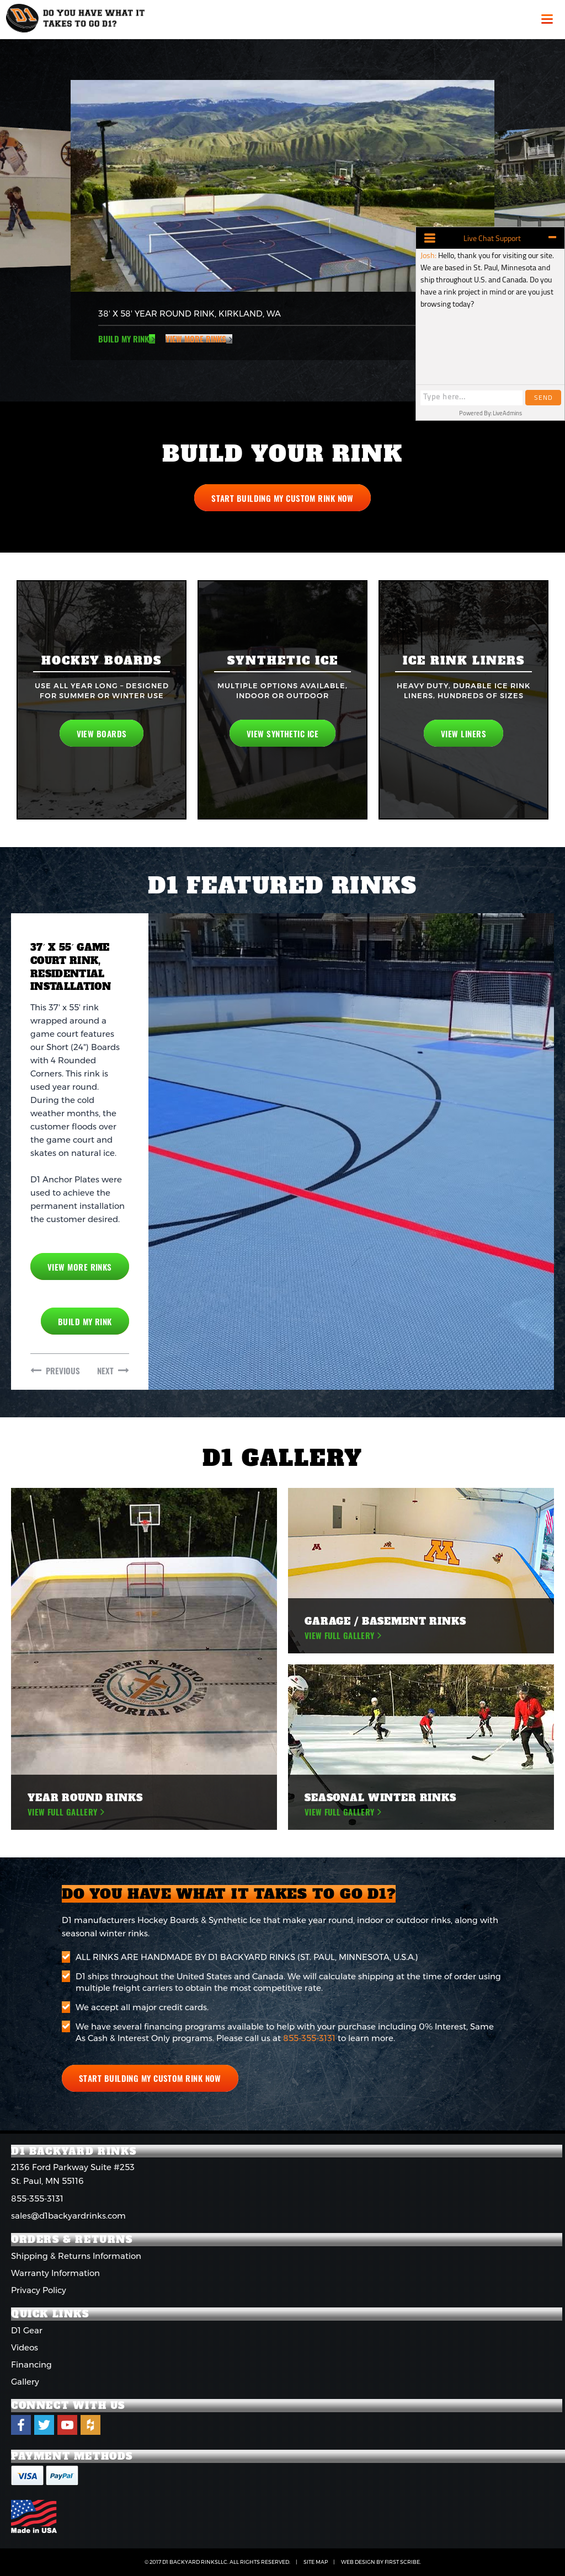 D1 Backyard Rinks's website screenshot on Jul 2017 - D1 Backyard Rinks Competitors, Revenue And Employees - Owler Company